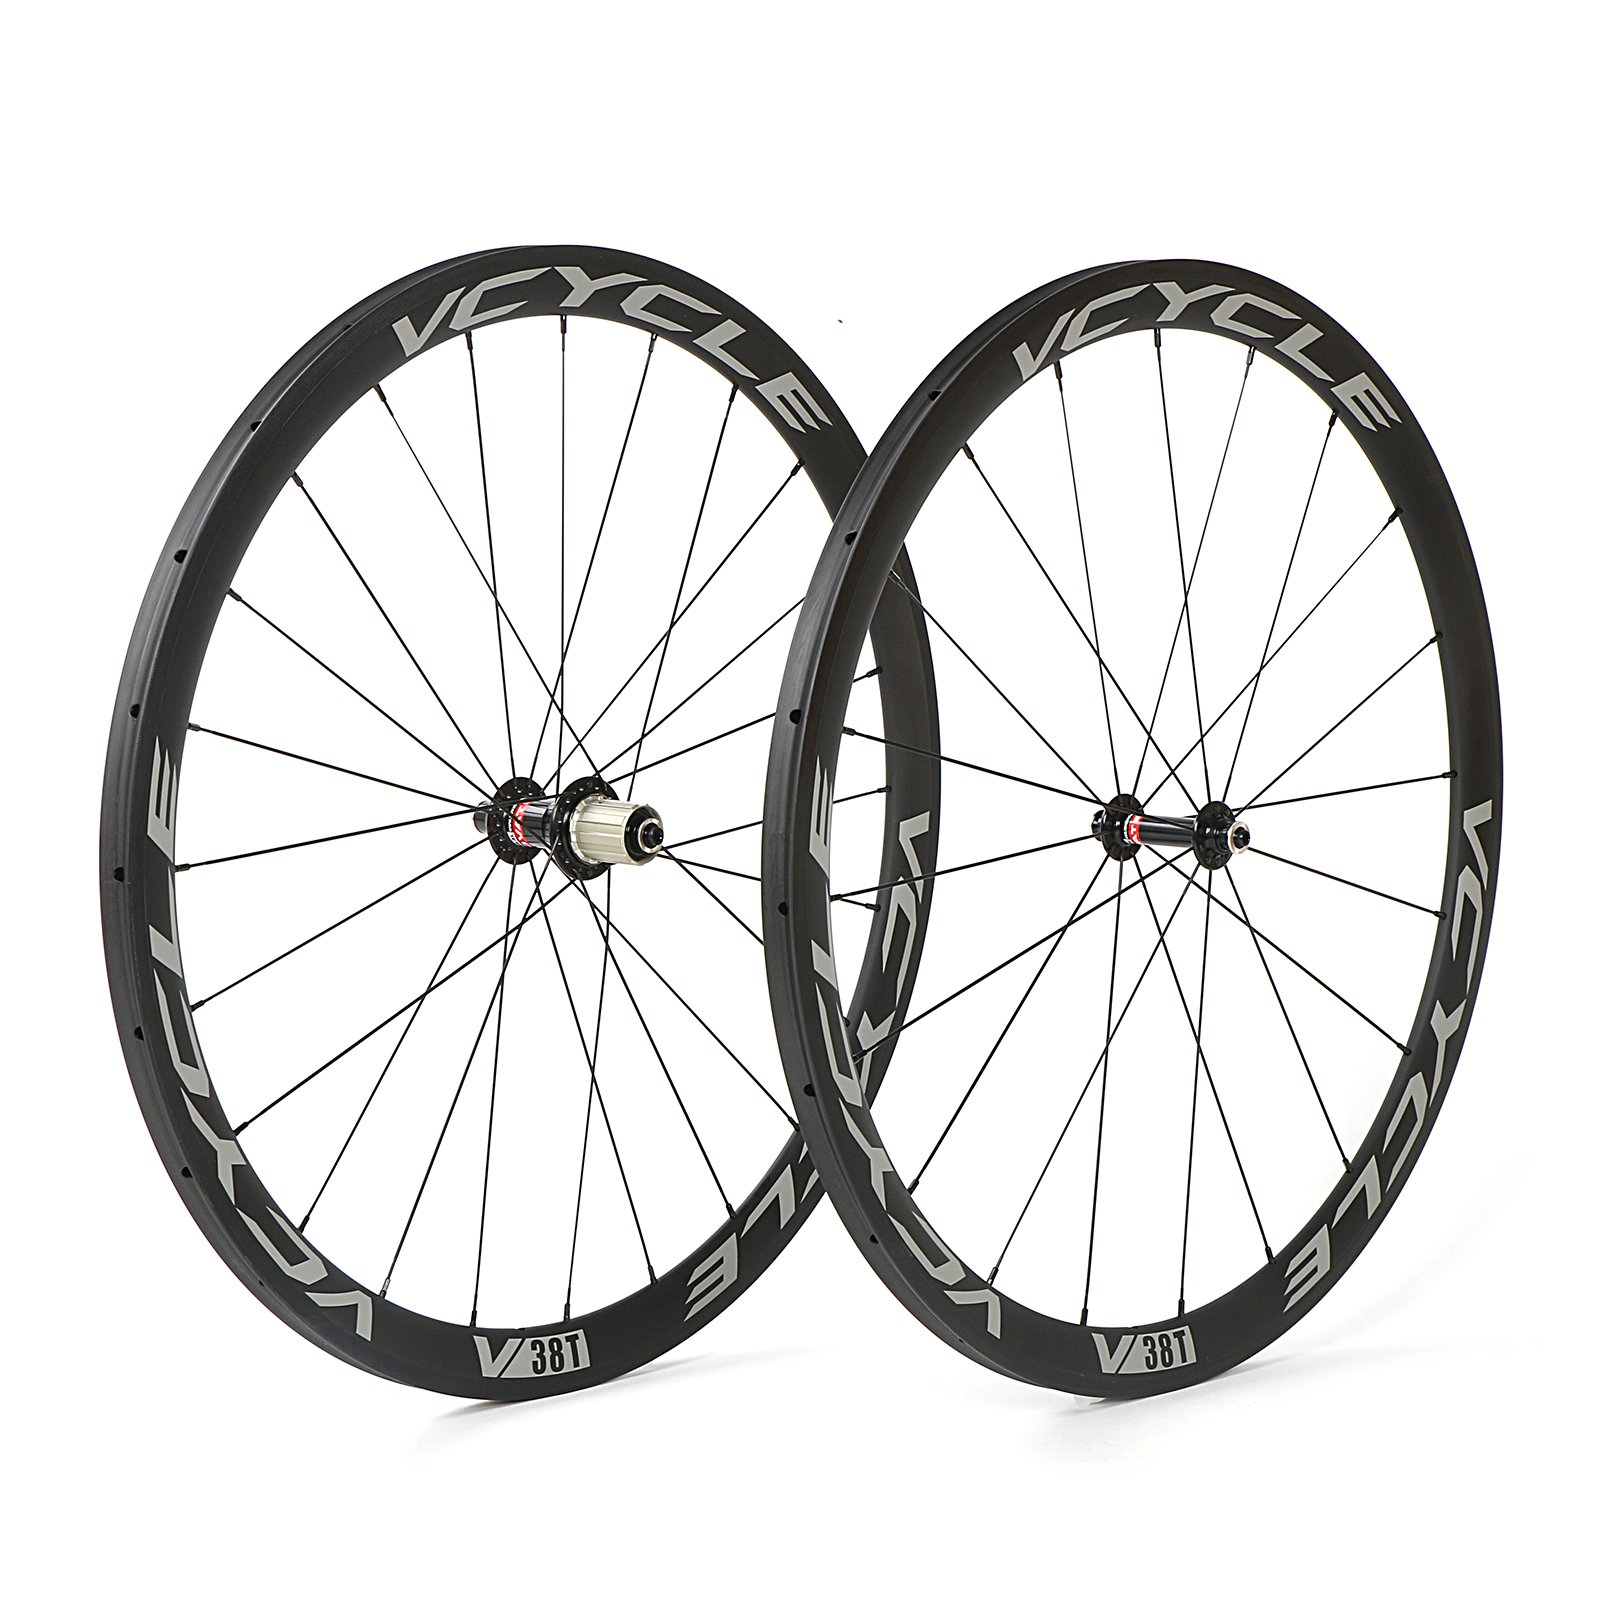 VCYCLE 700C Carbono Bicicleta Ruedas 38mm Tubular UD Mate Ultra Ligero Shimano o Sram 8/